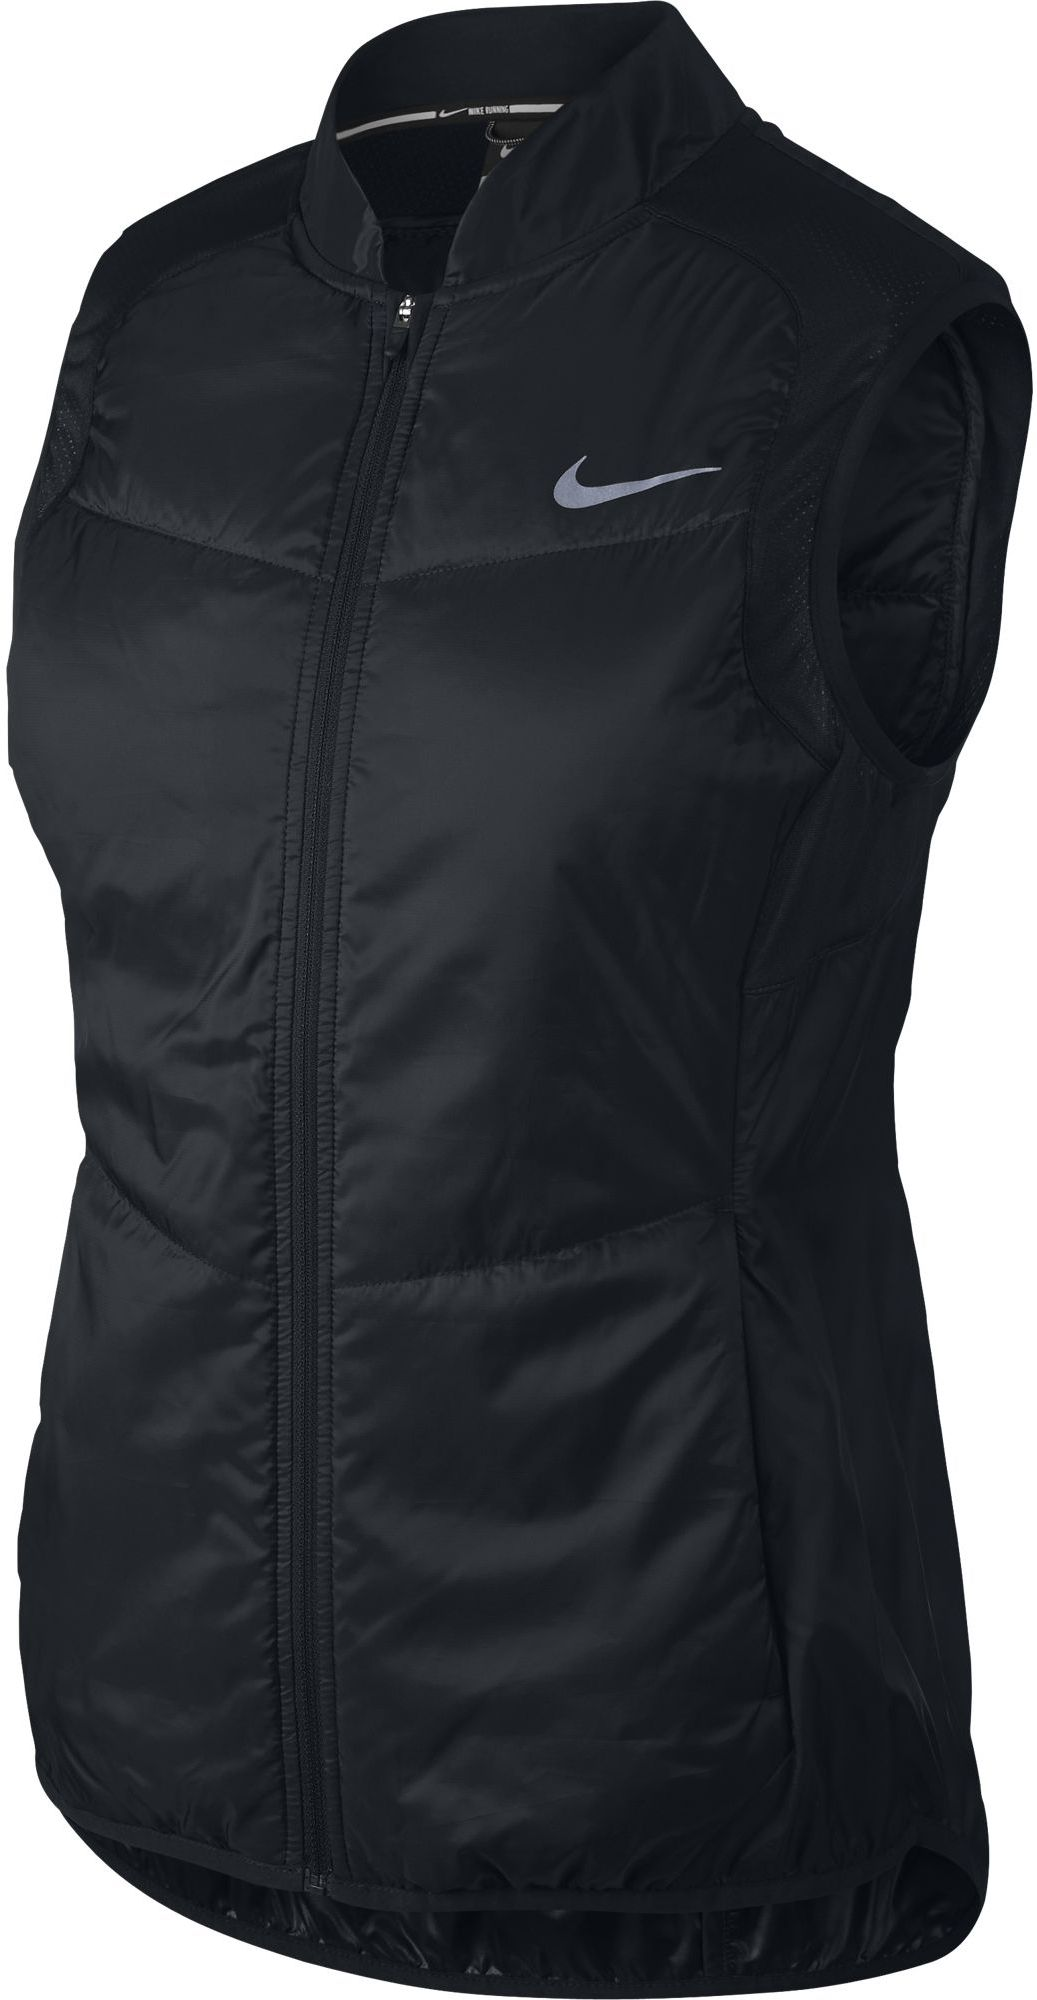 05730287d3db nike-689256-010-women-s-nike-polyfill-running-vest 3.jpg